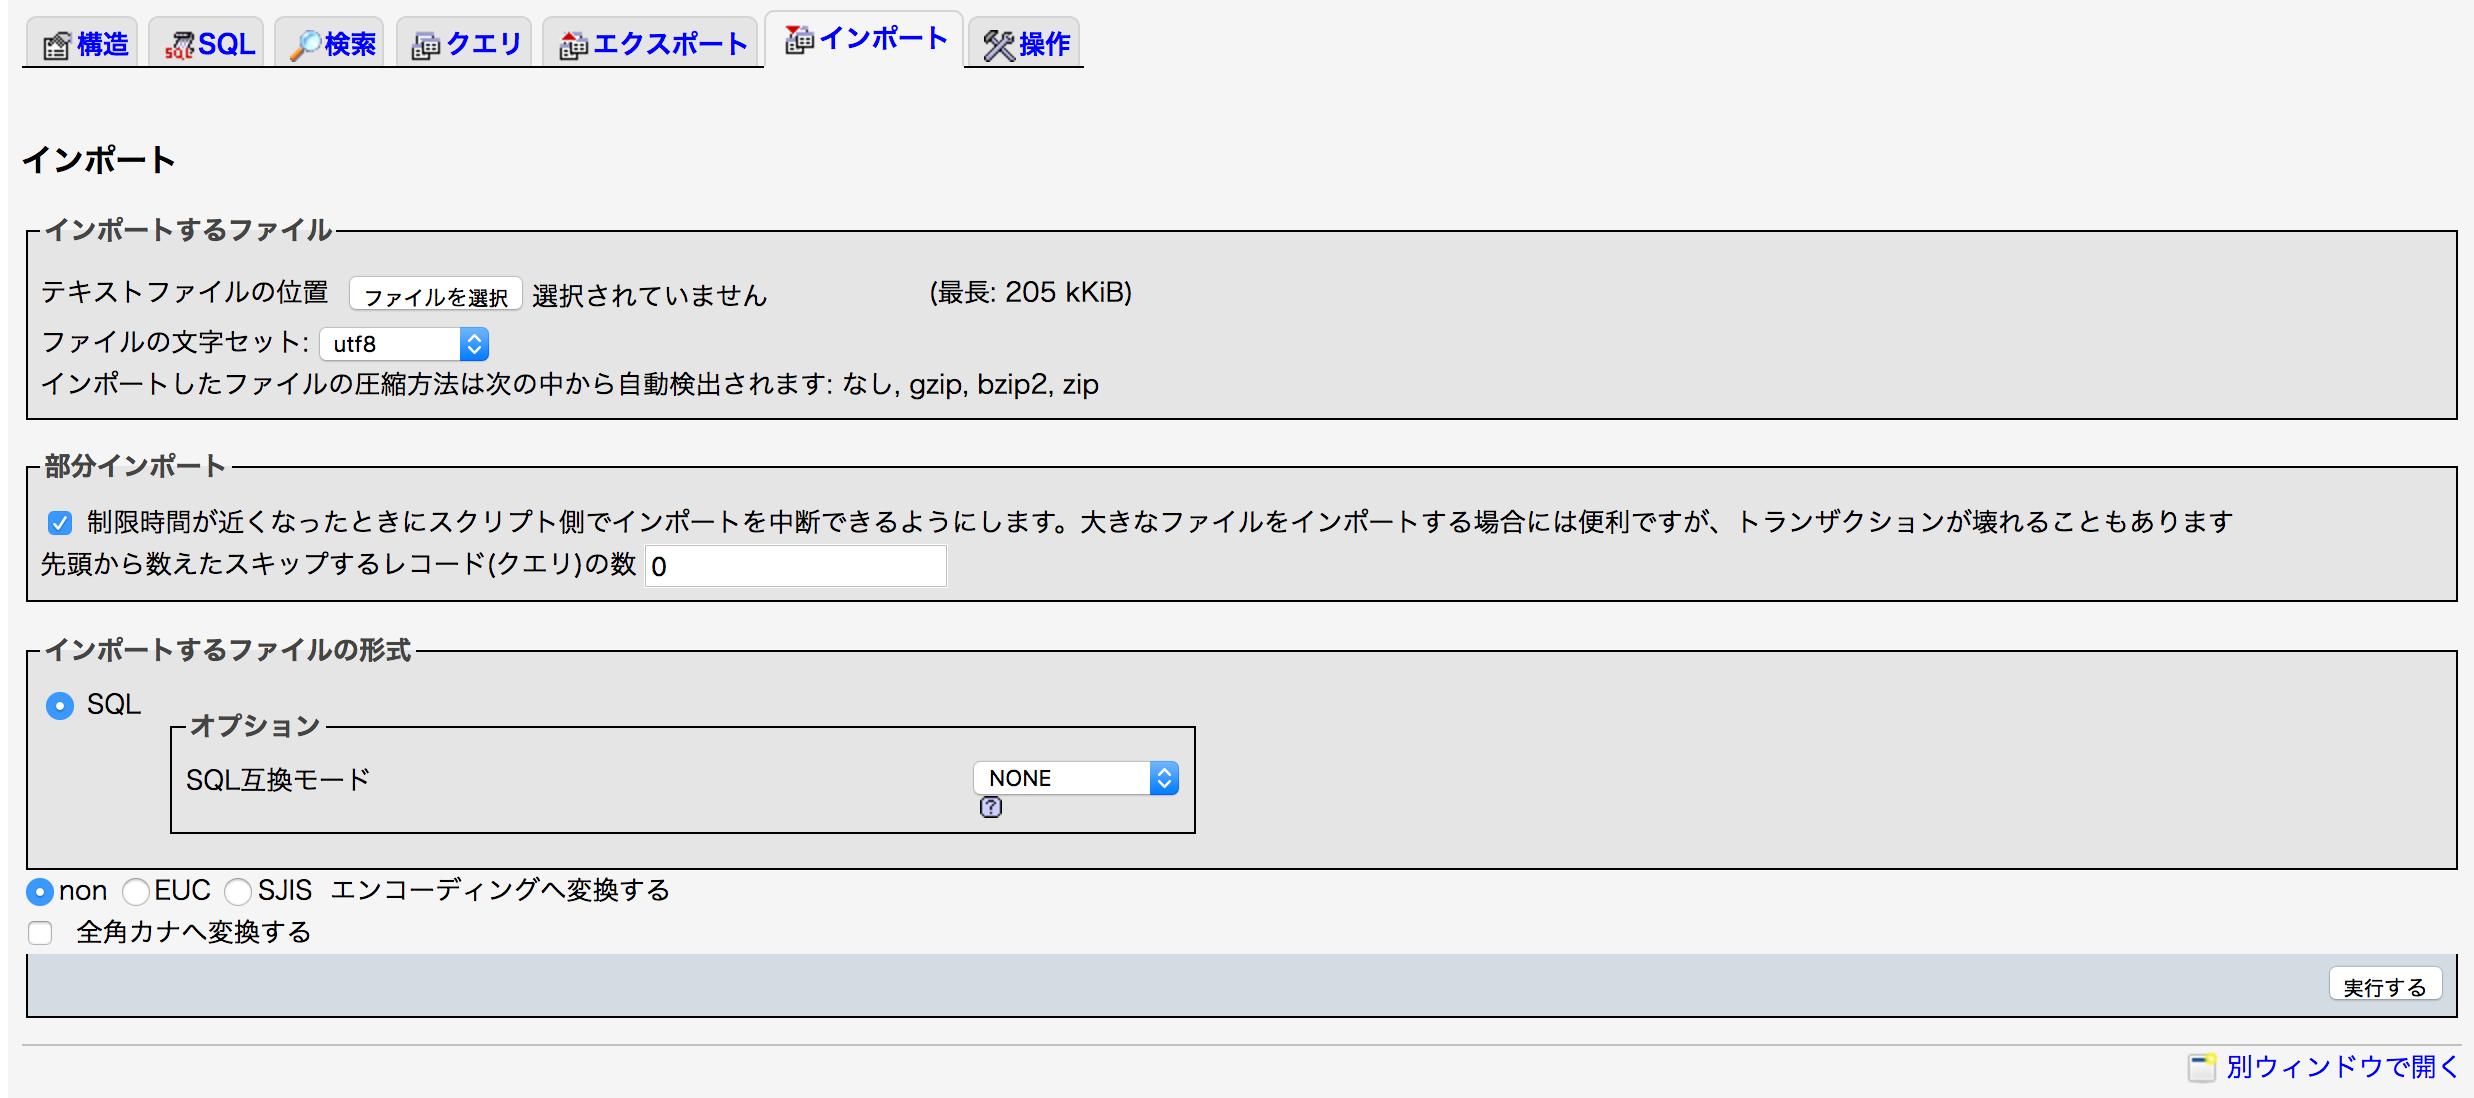 import - wordpressのドメイン変更9つのステップと移行時の注意点まとめ